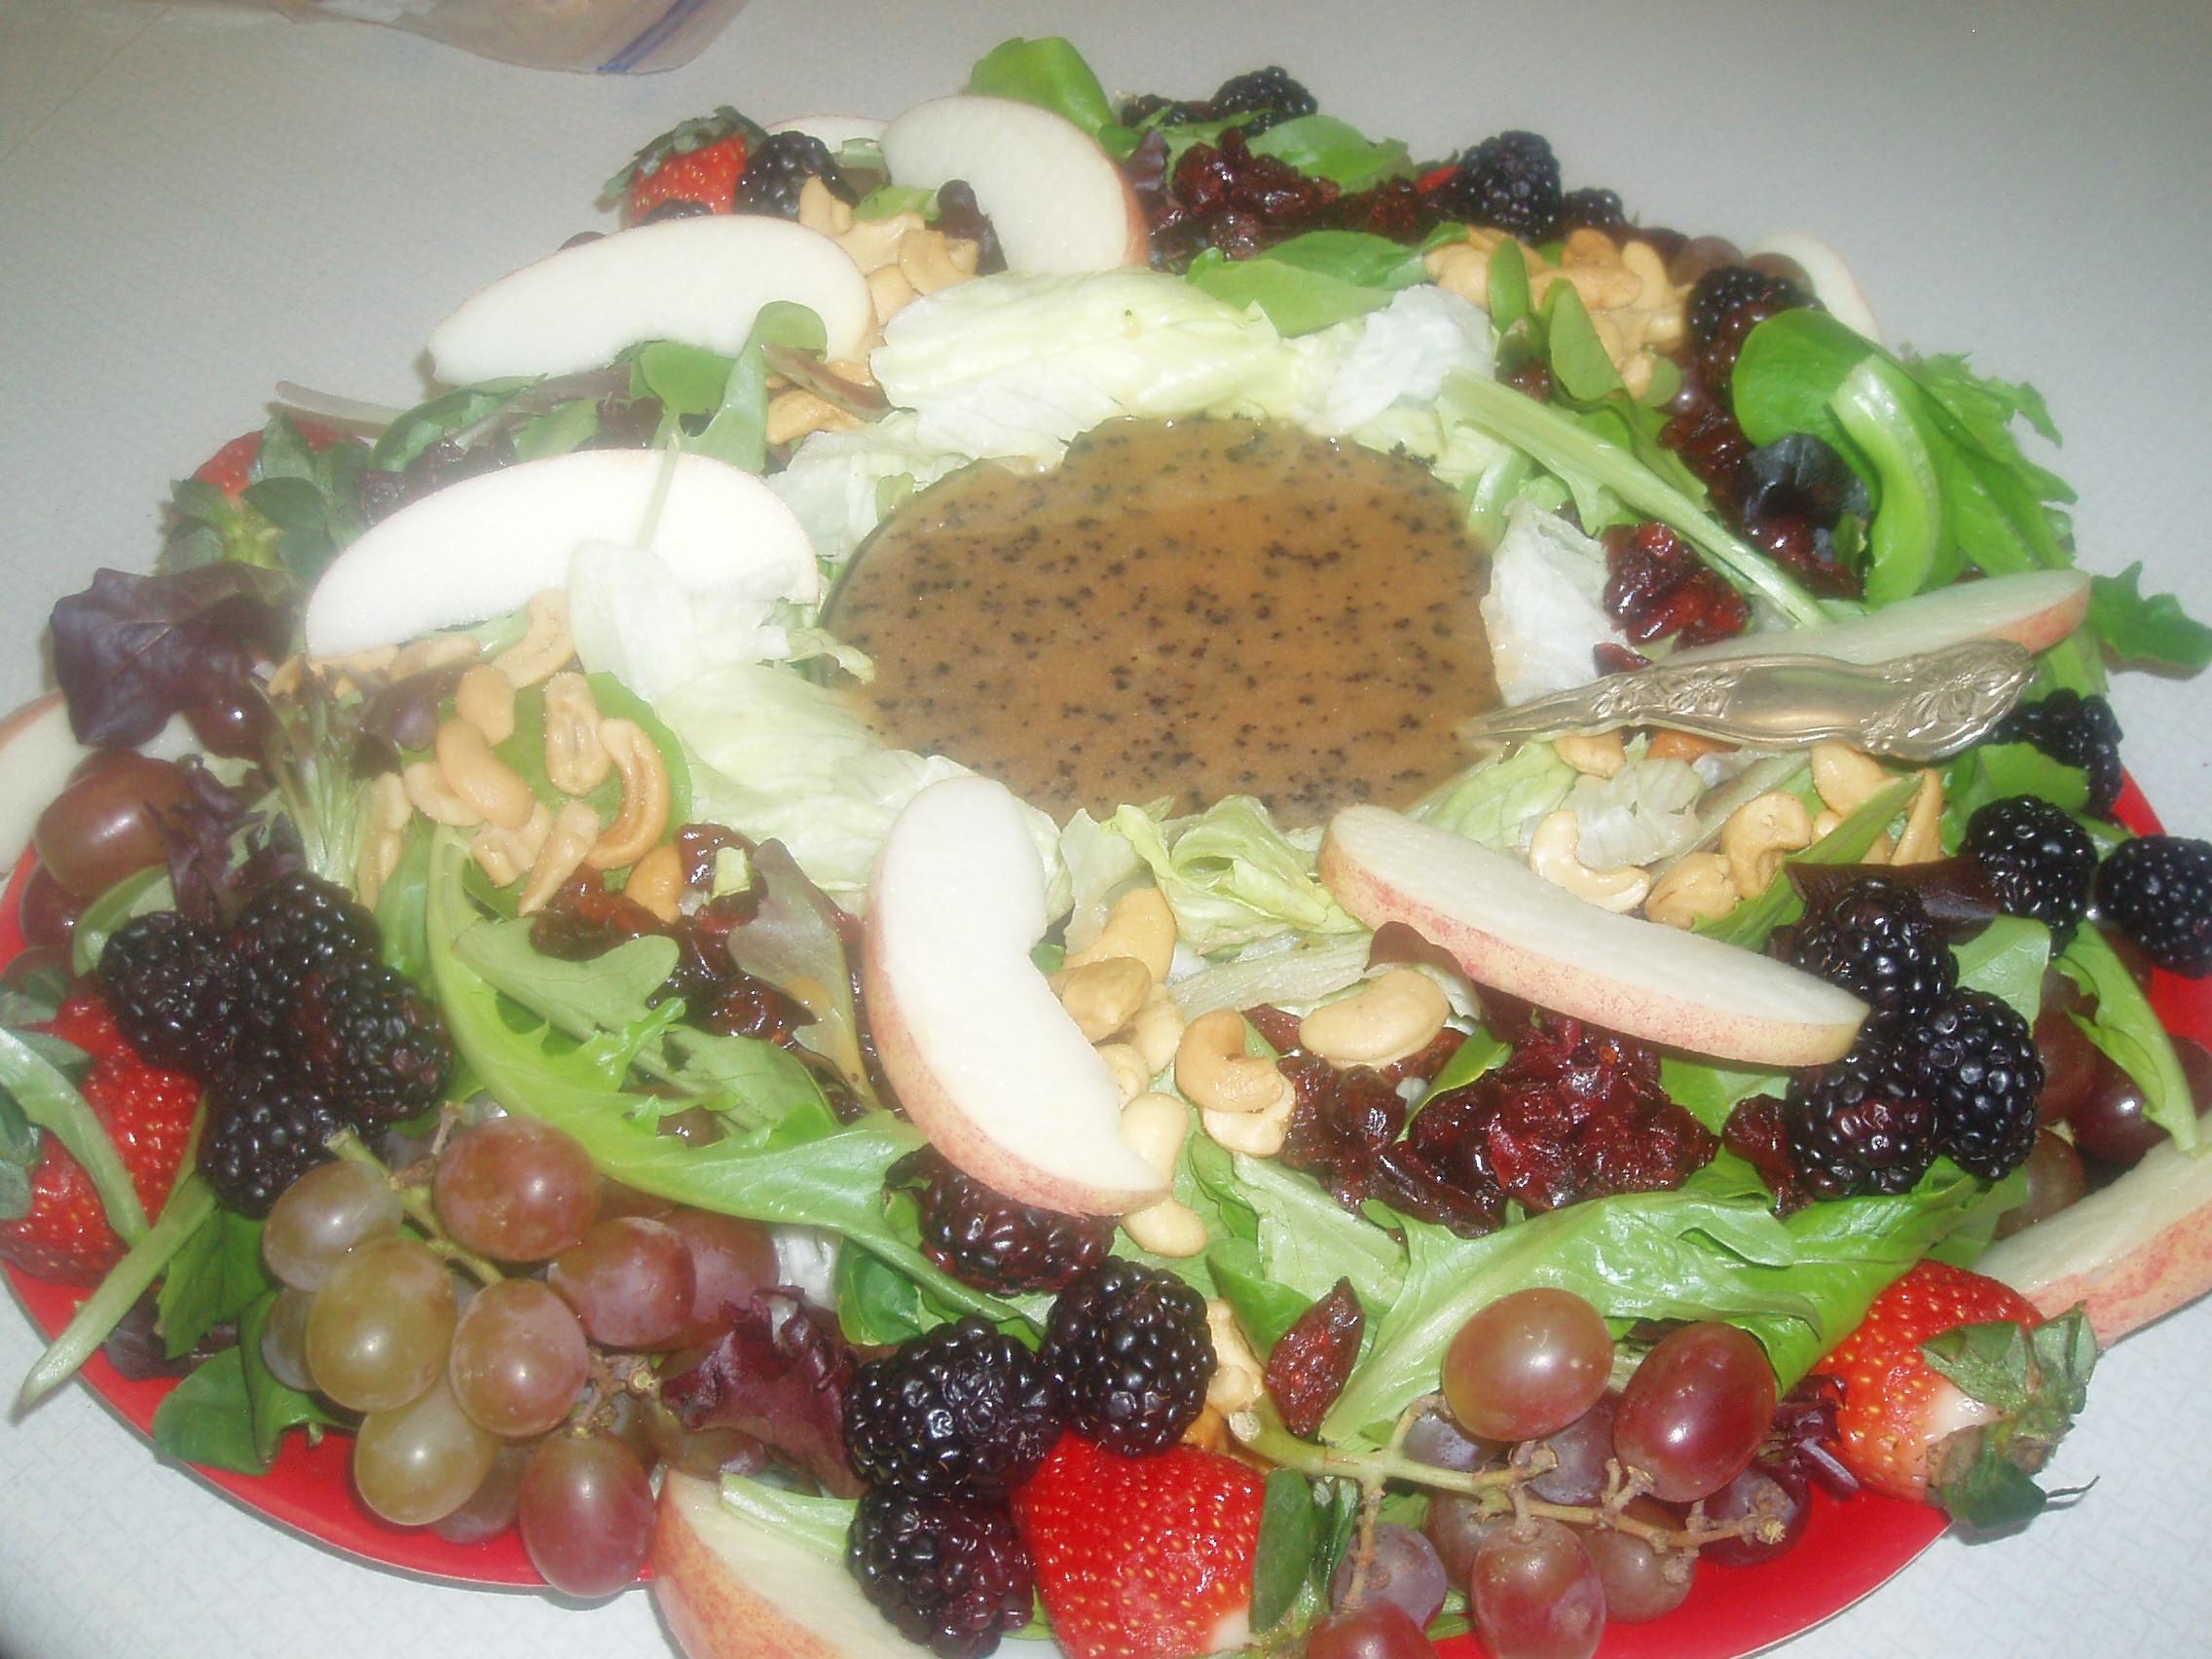 Name:  winter berry salad2.jpg.JPG Views: 1282 Size:  853.0 KB